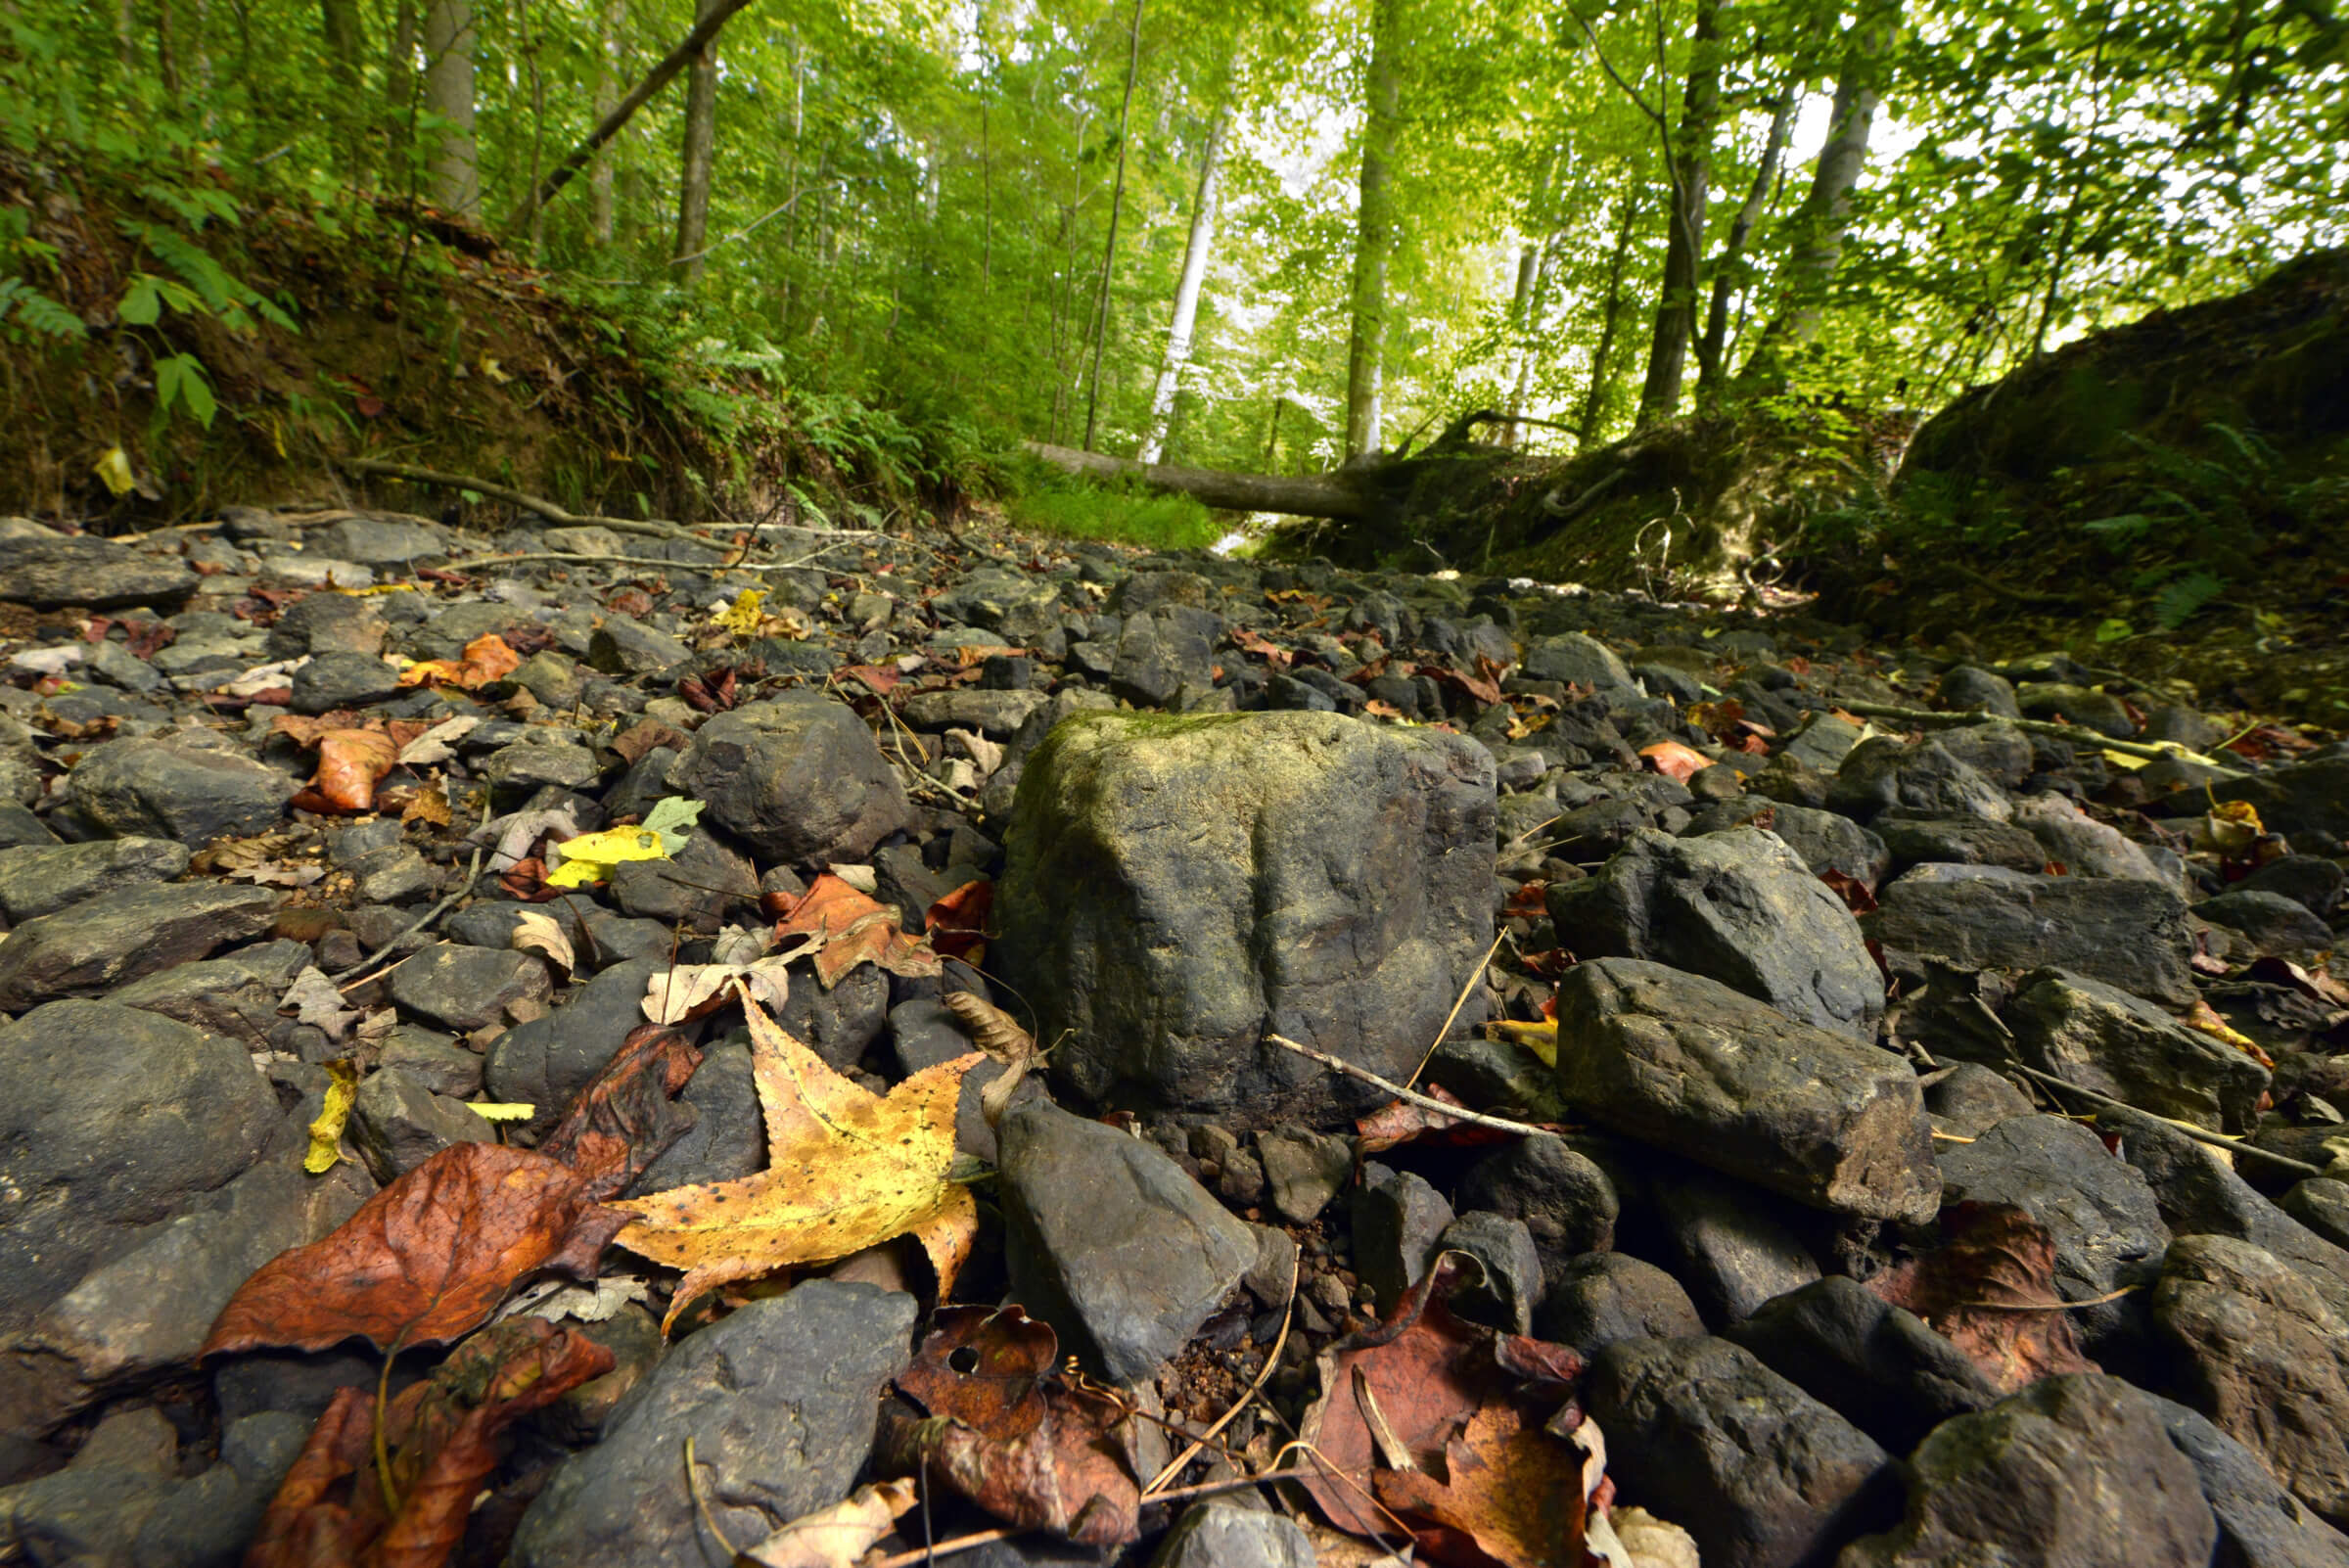 Photo: Hagans Forest by Nancy Pierce